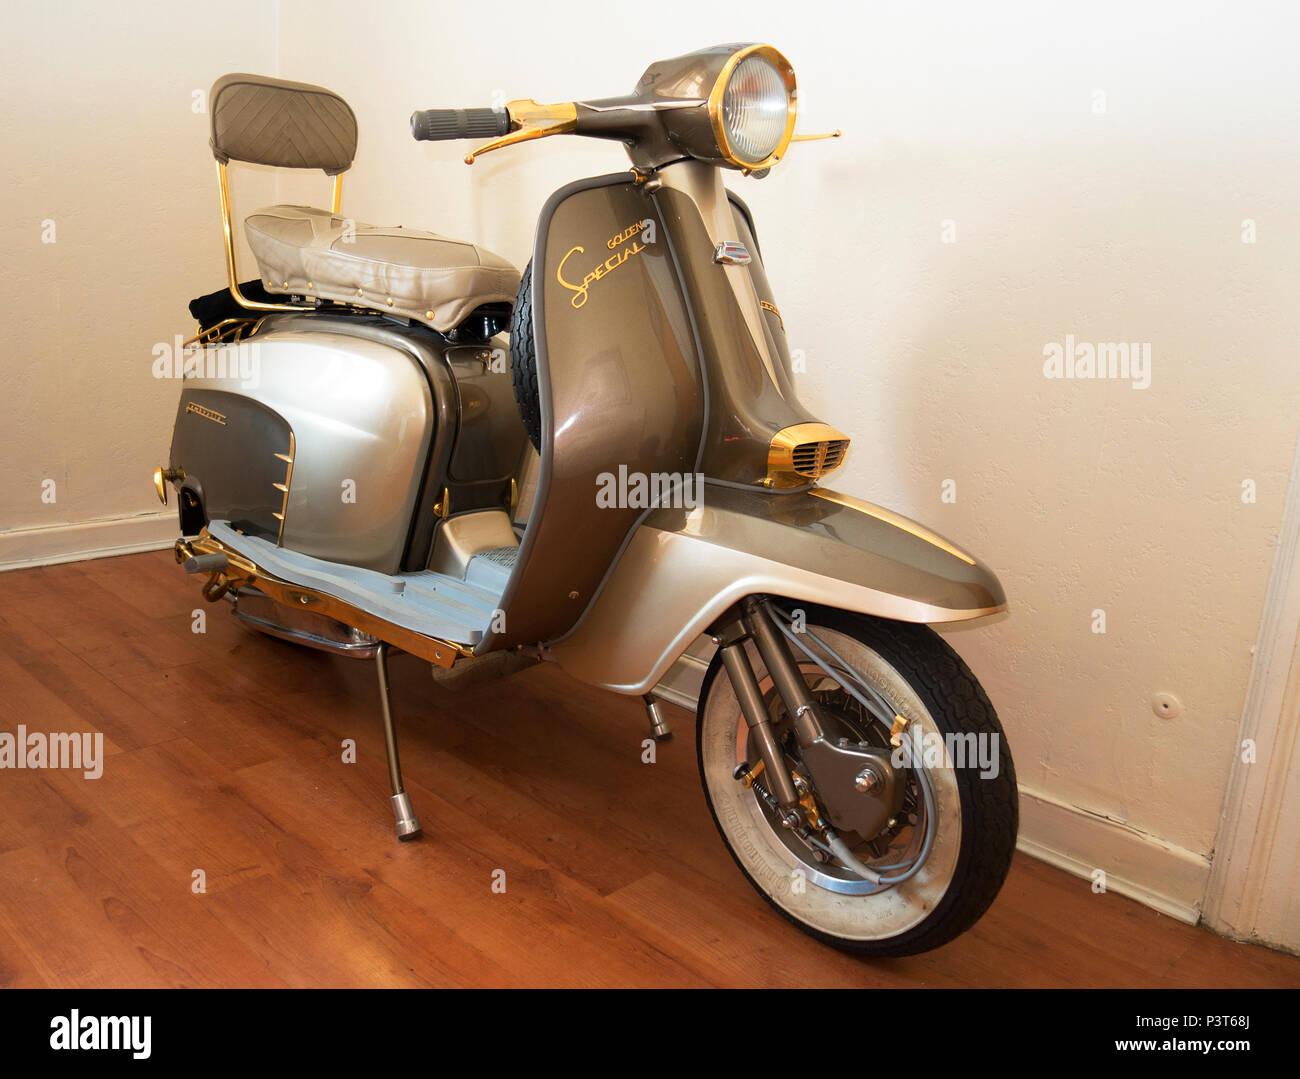 1963 lambretta LI golden special scooter - Stock Image